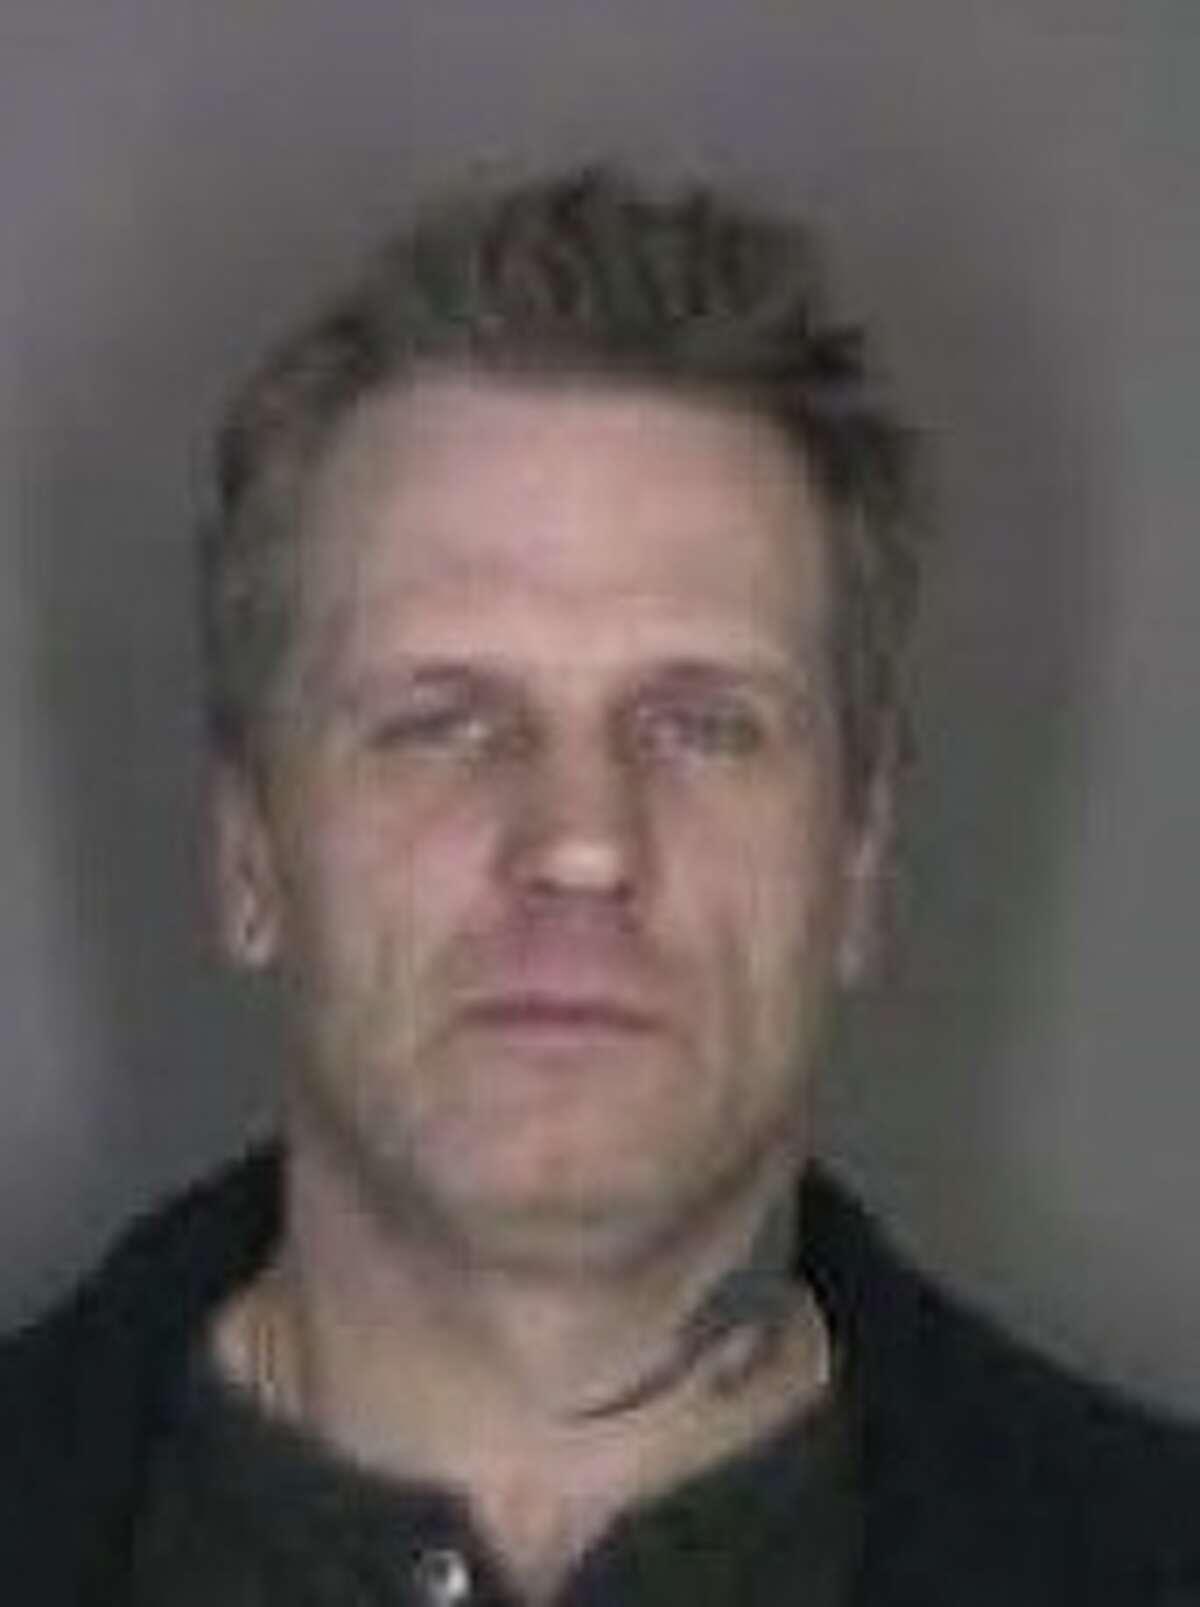 Michael S. Peabody (East Greenbush Police photo)